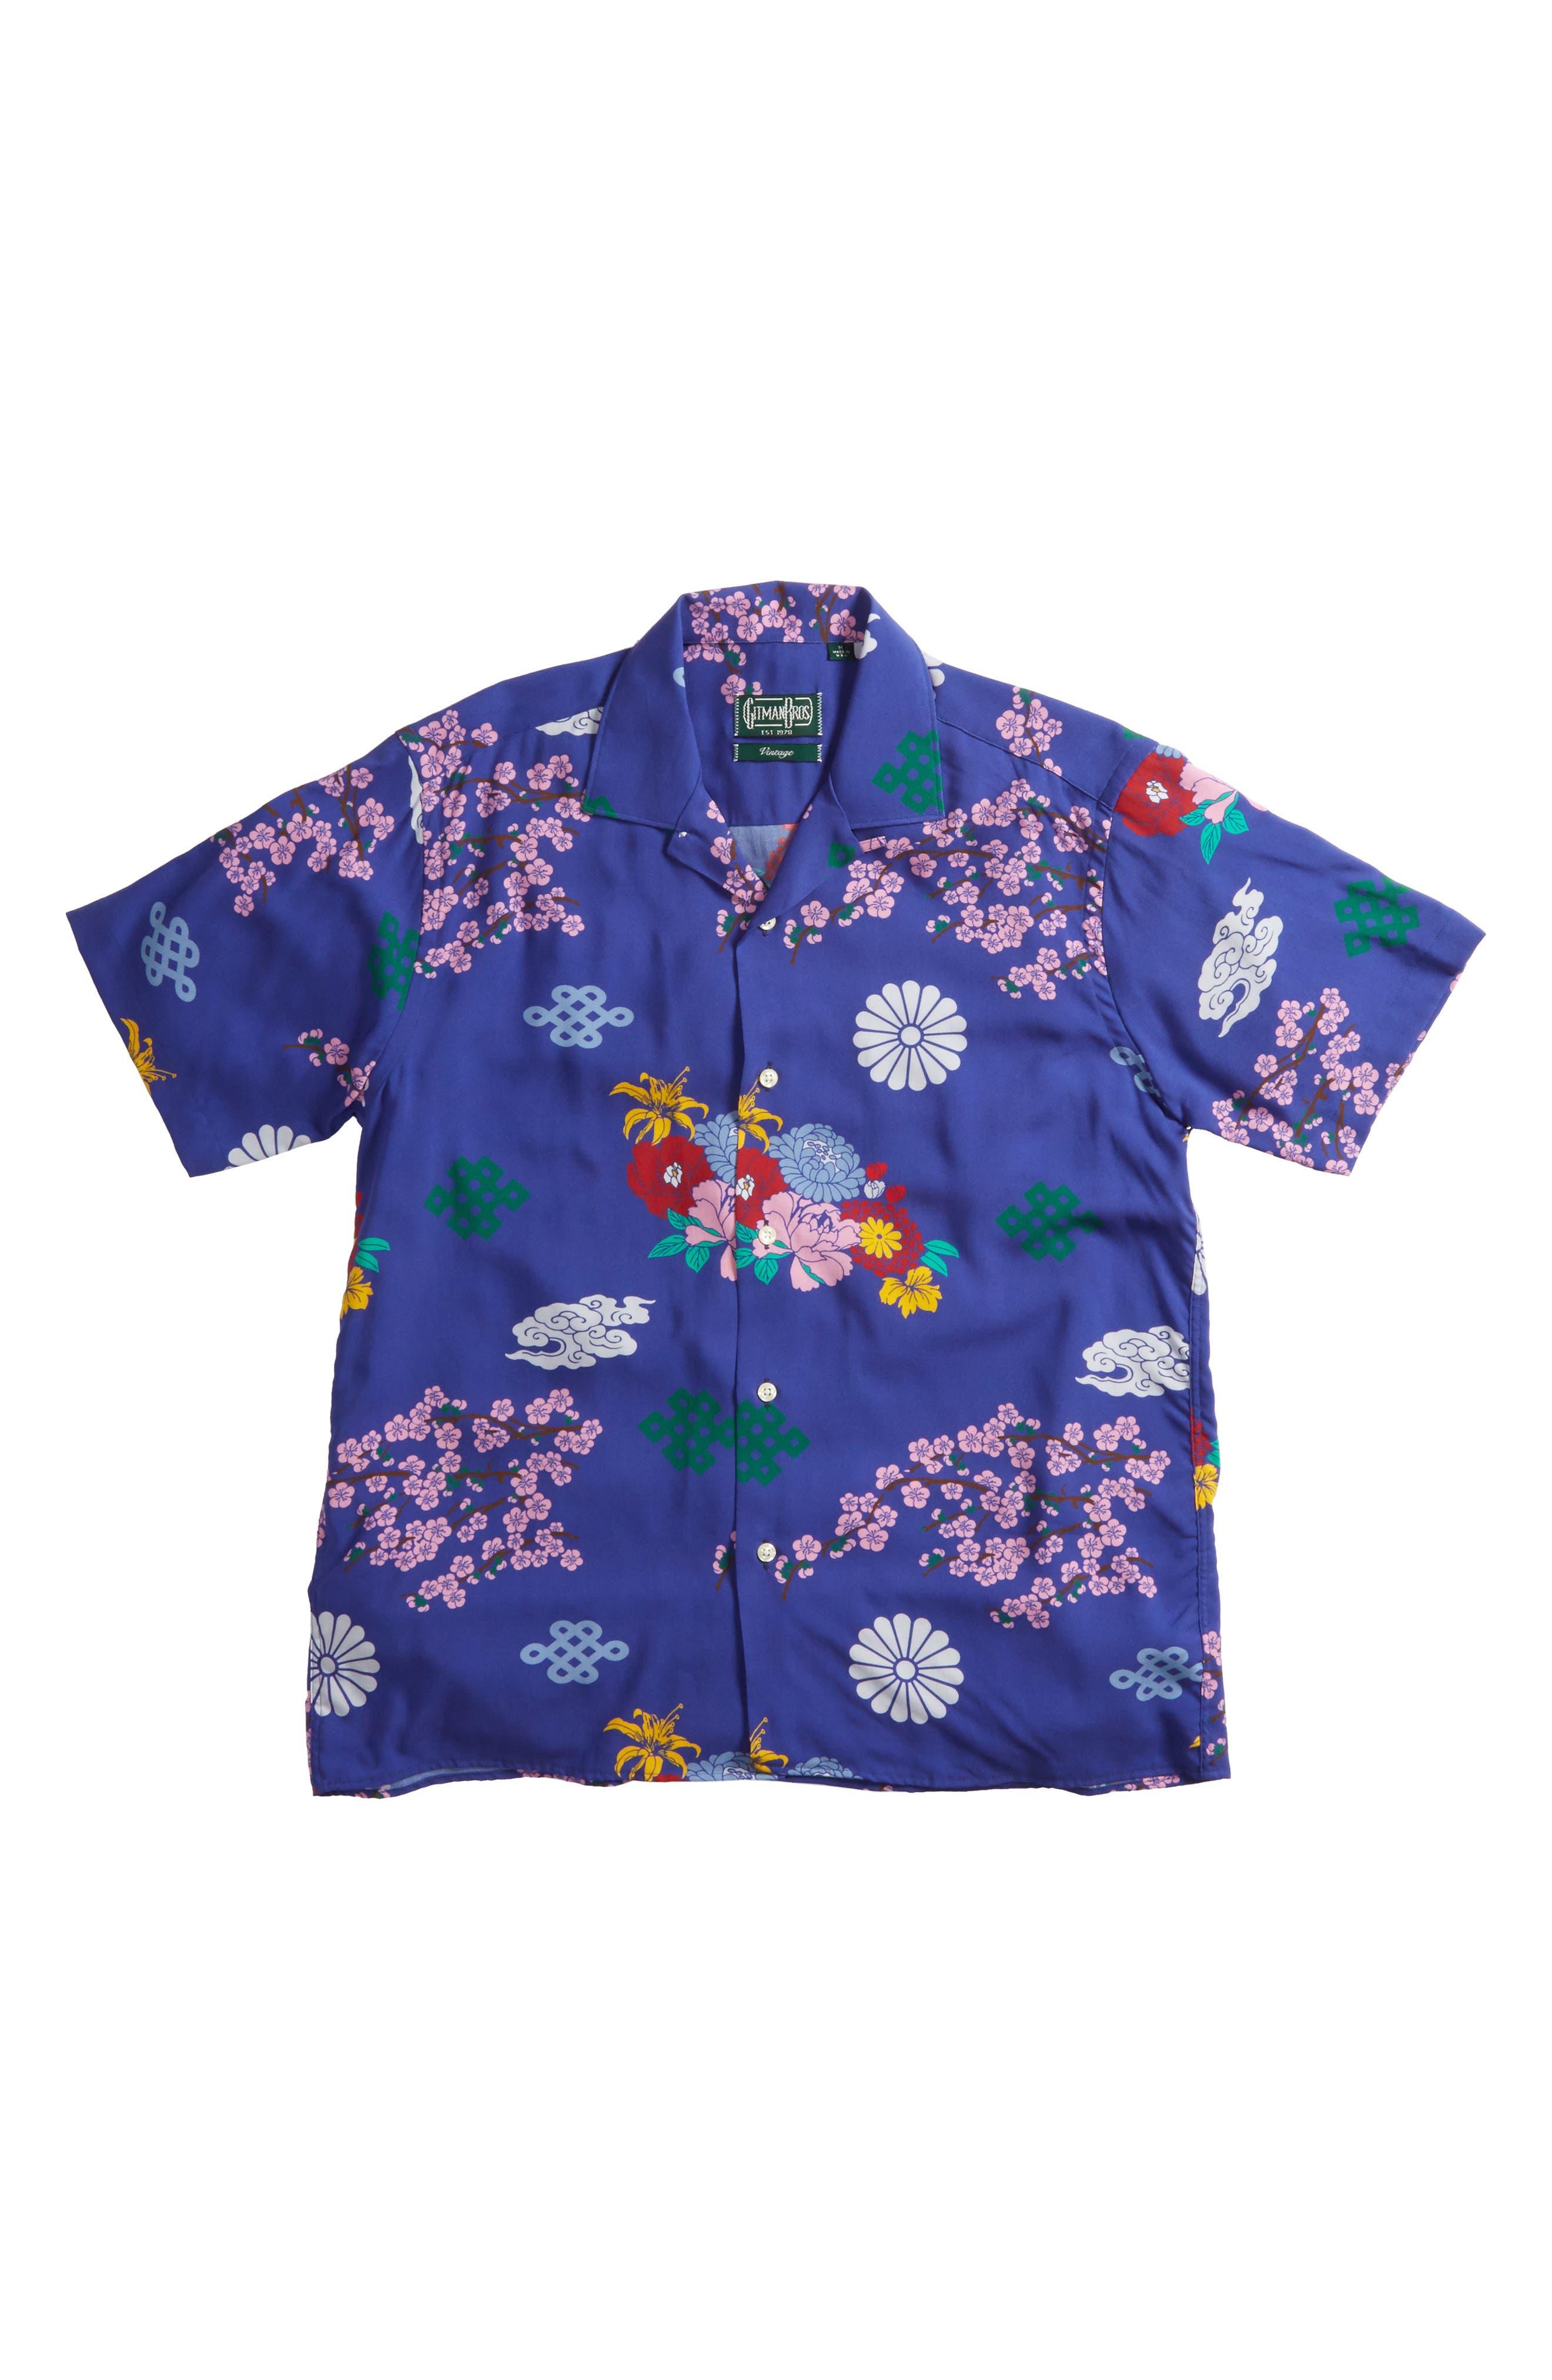 x The North Face Men's Floral Print Camp Shirt,                         Main,                         color, 400